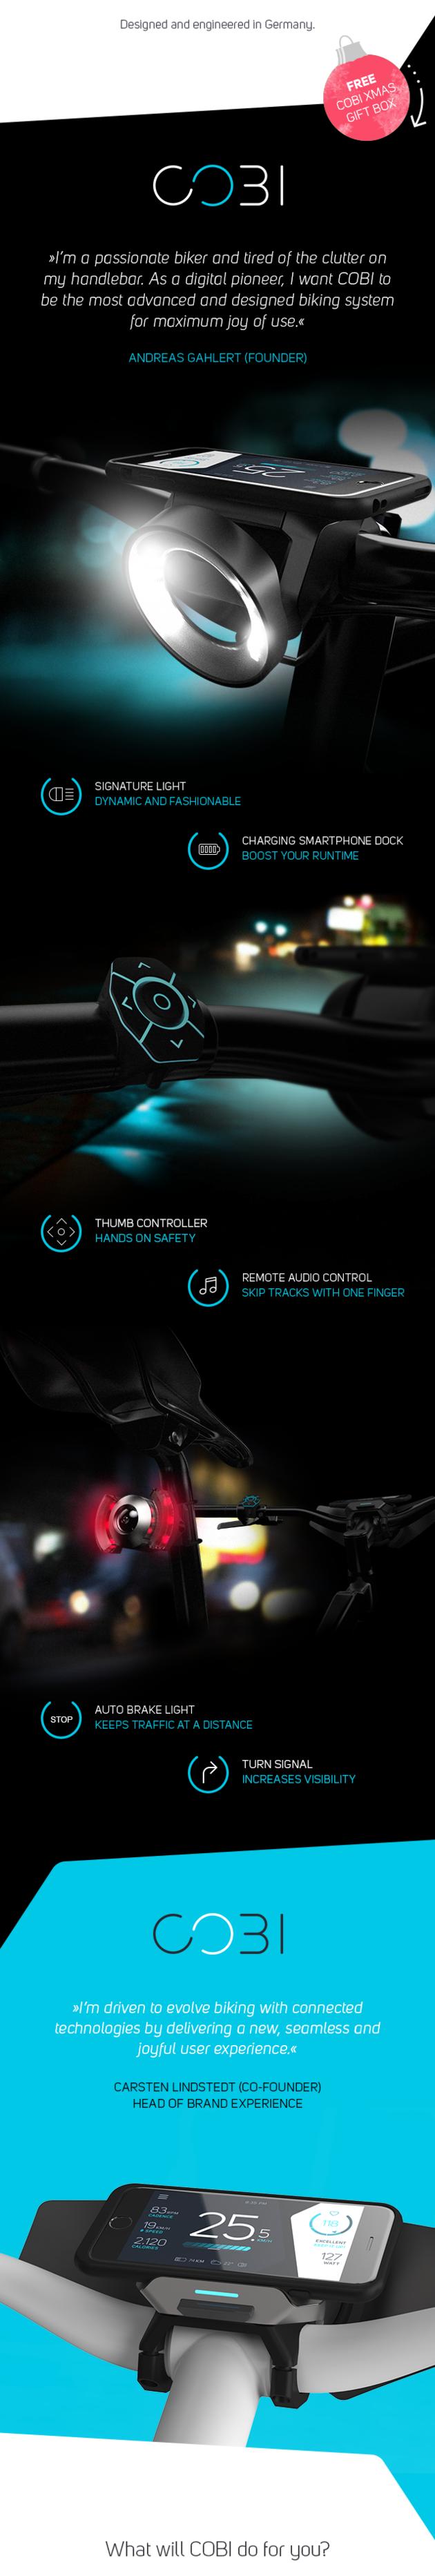 infographic cobi